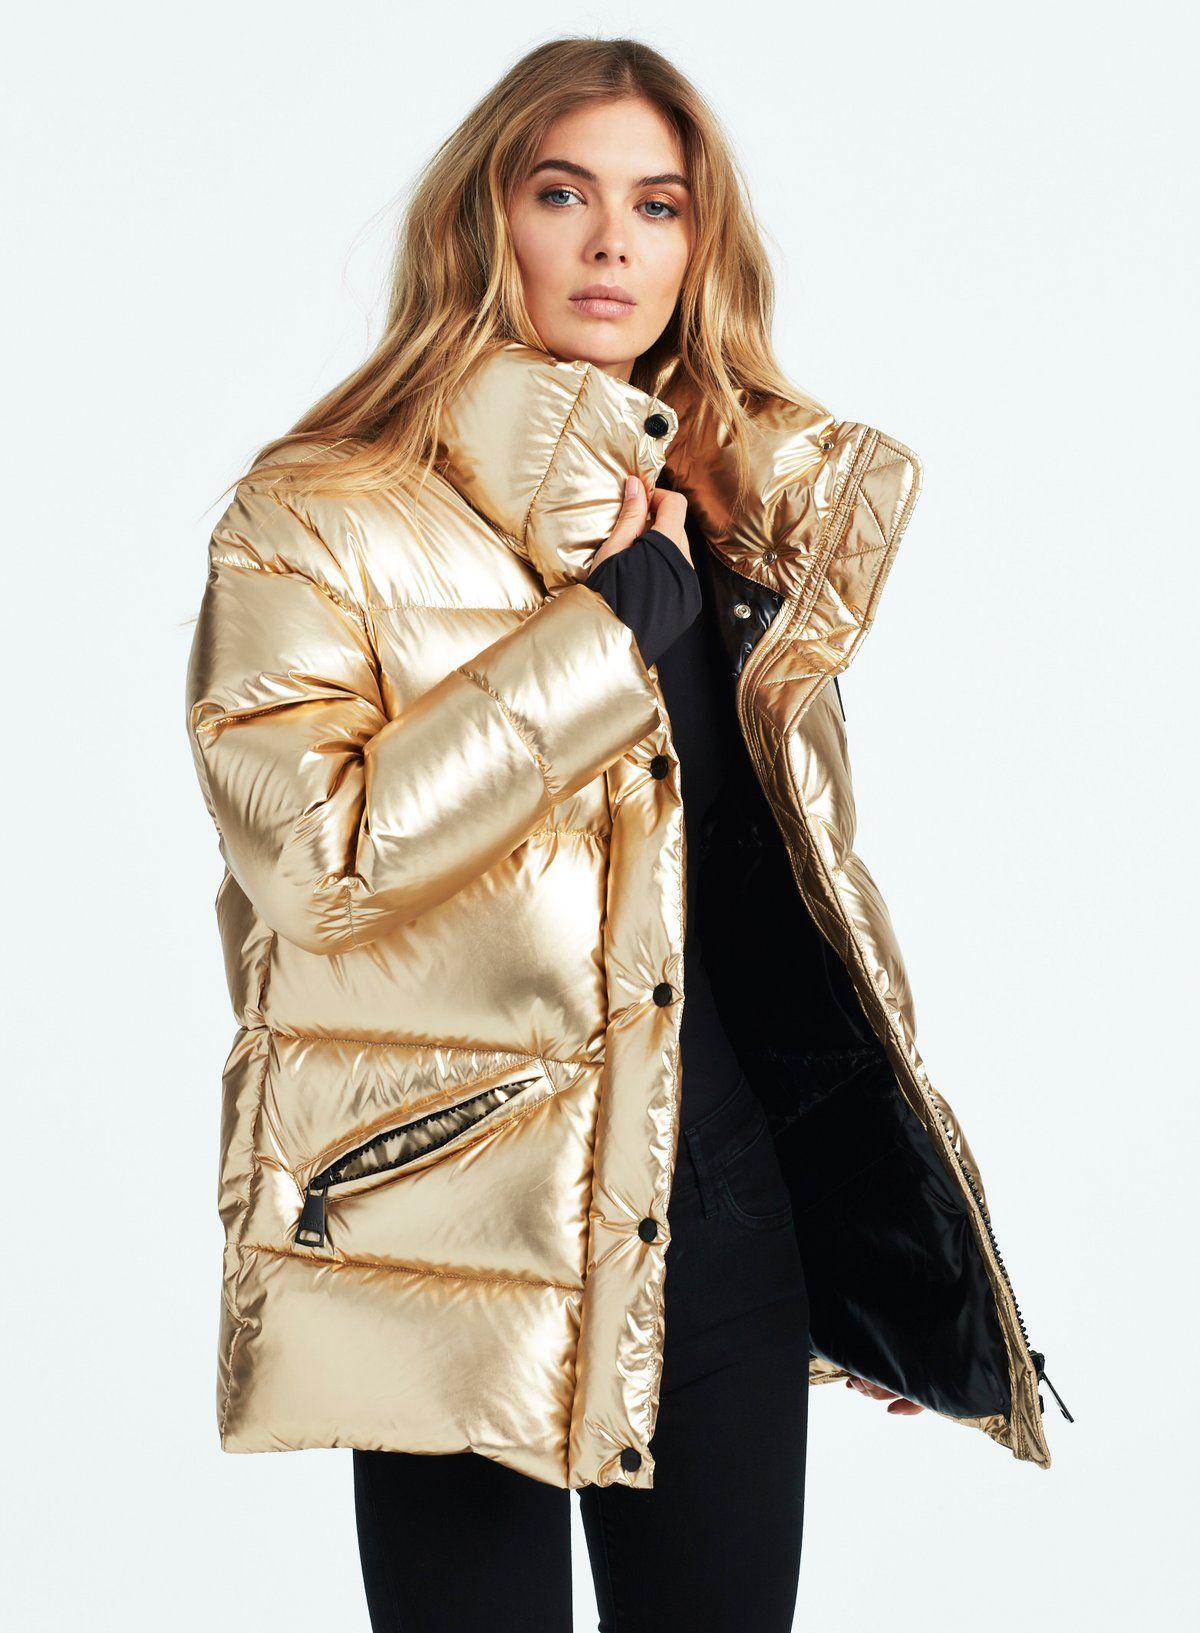 Zoe Gold Jet Gold Jacket Outfit Puffer Jacket Women Outerwear Women [ 1633 x 1200 Pixel ]